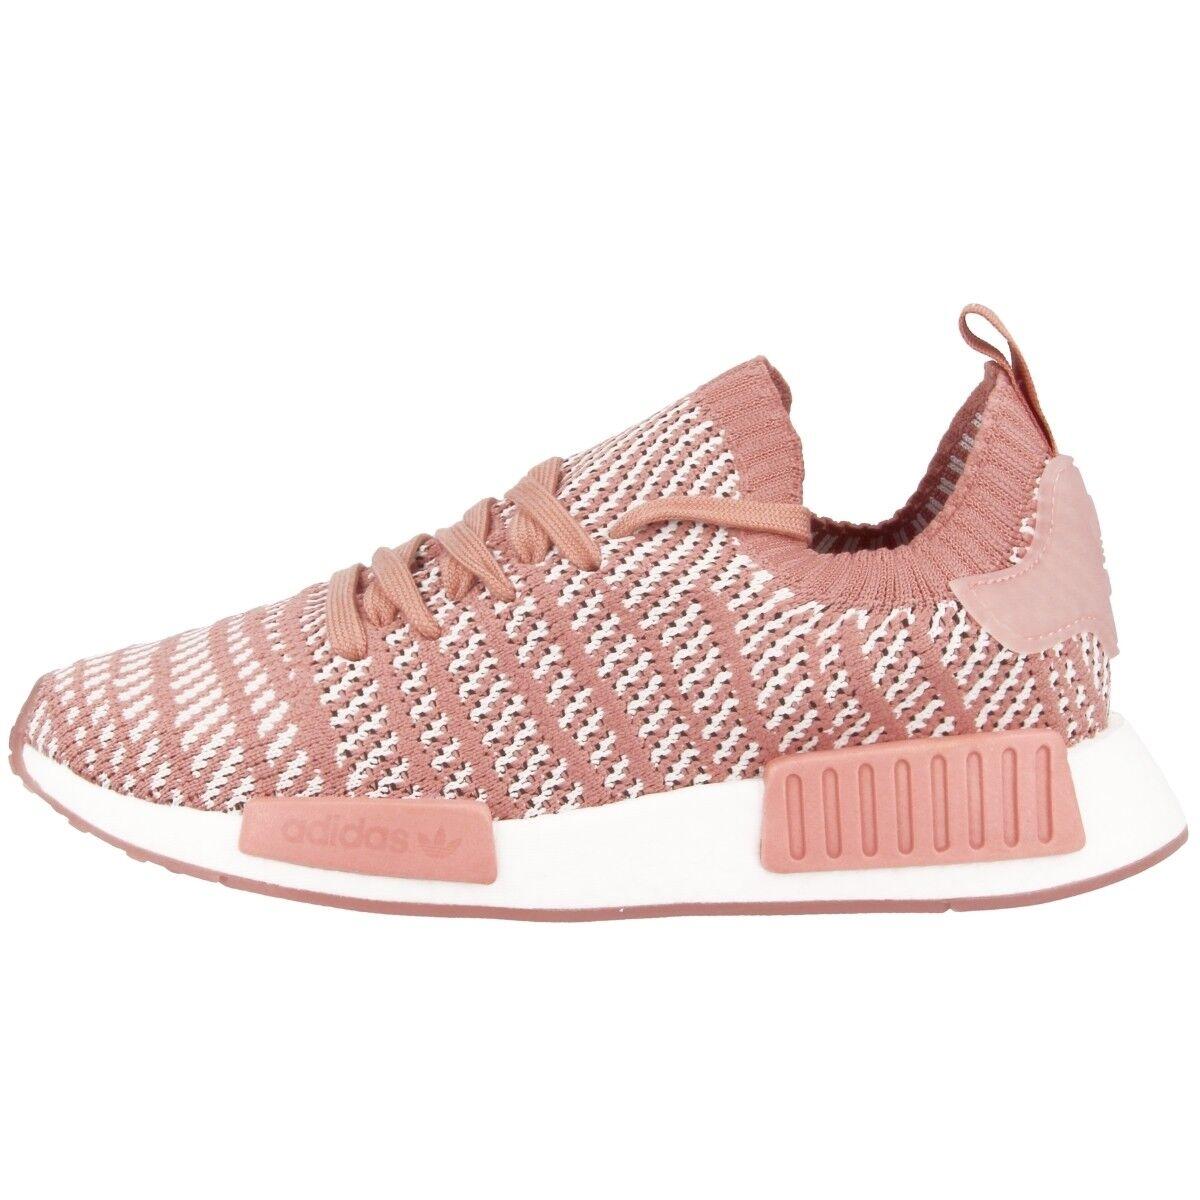 Adidas NMD _ R1 stlt PK Primeknit Zapatos Mujer Zapatillas Ash FUCSIA cq2028